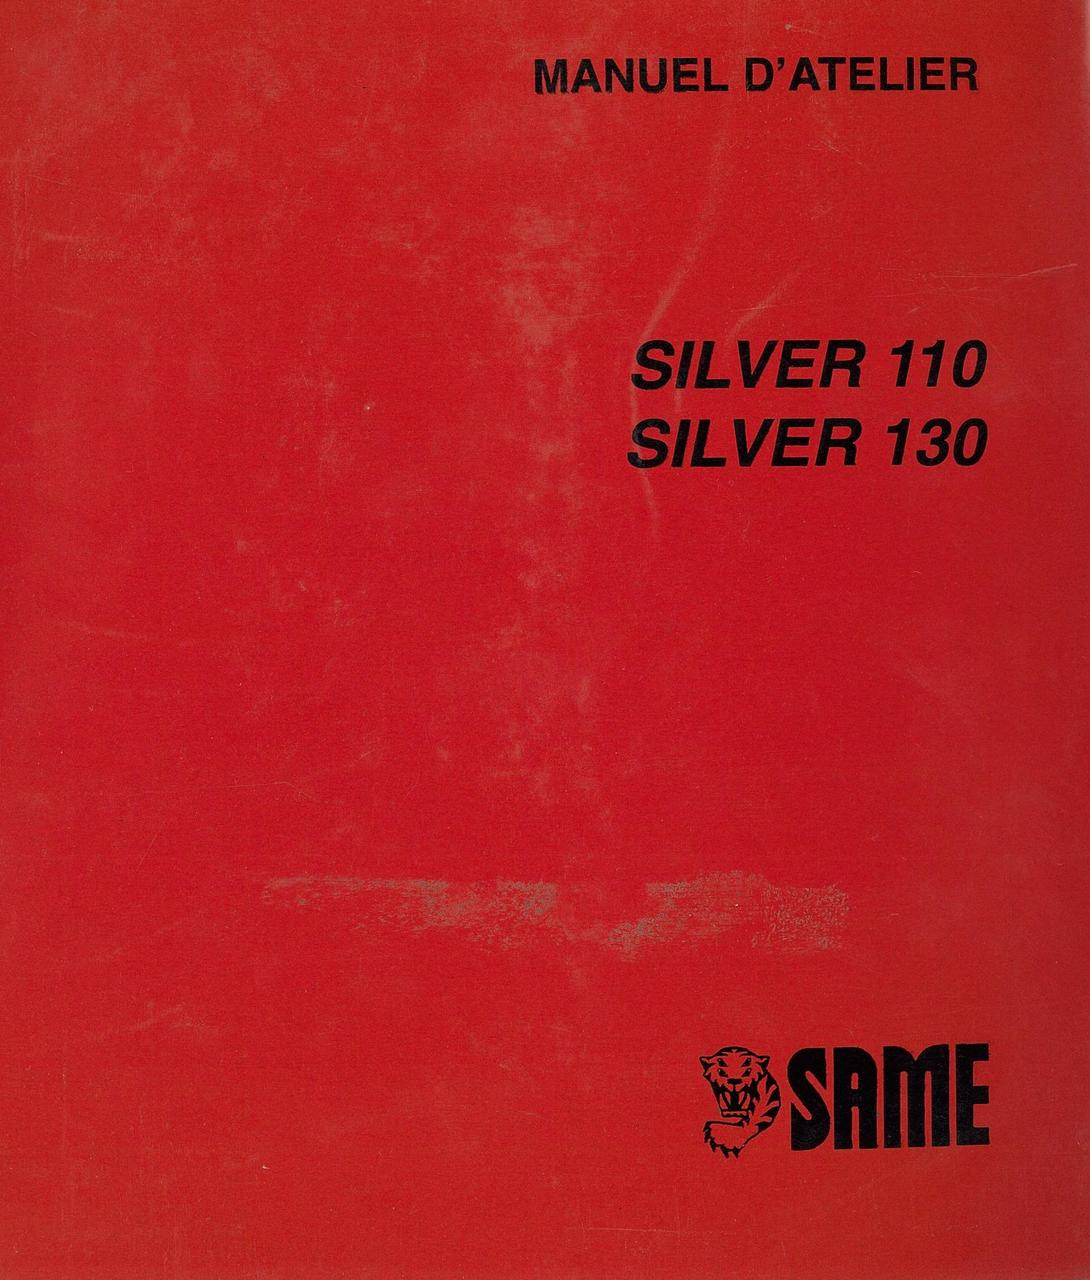 SILVER 110-130 - Manuel d'atelier